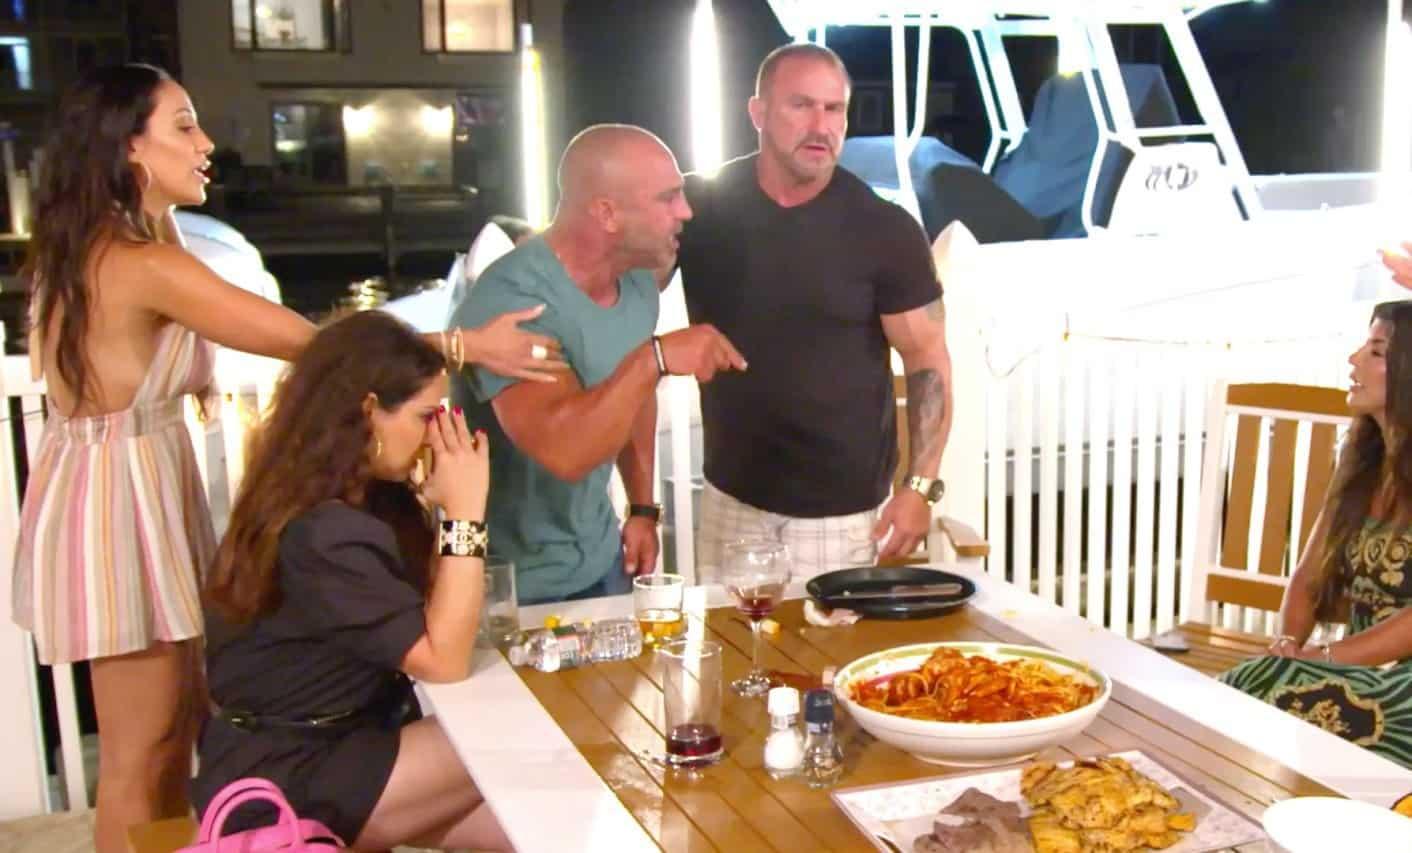 RHONJ Recap: Joe Goes Off On Teresa About Her Ex Husband Dividing Their Family, Teresa Apologizes To Evan And Margaret Calls Jennifer A Sloppy Drunk